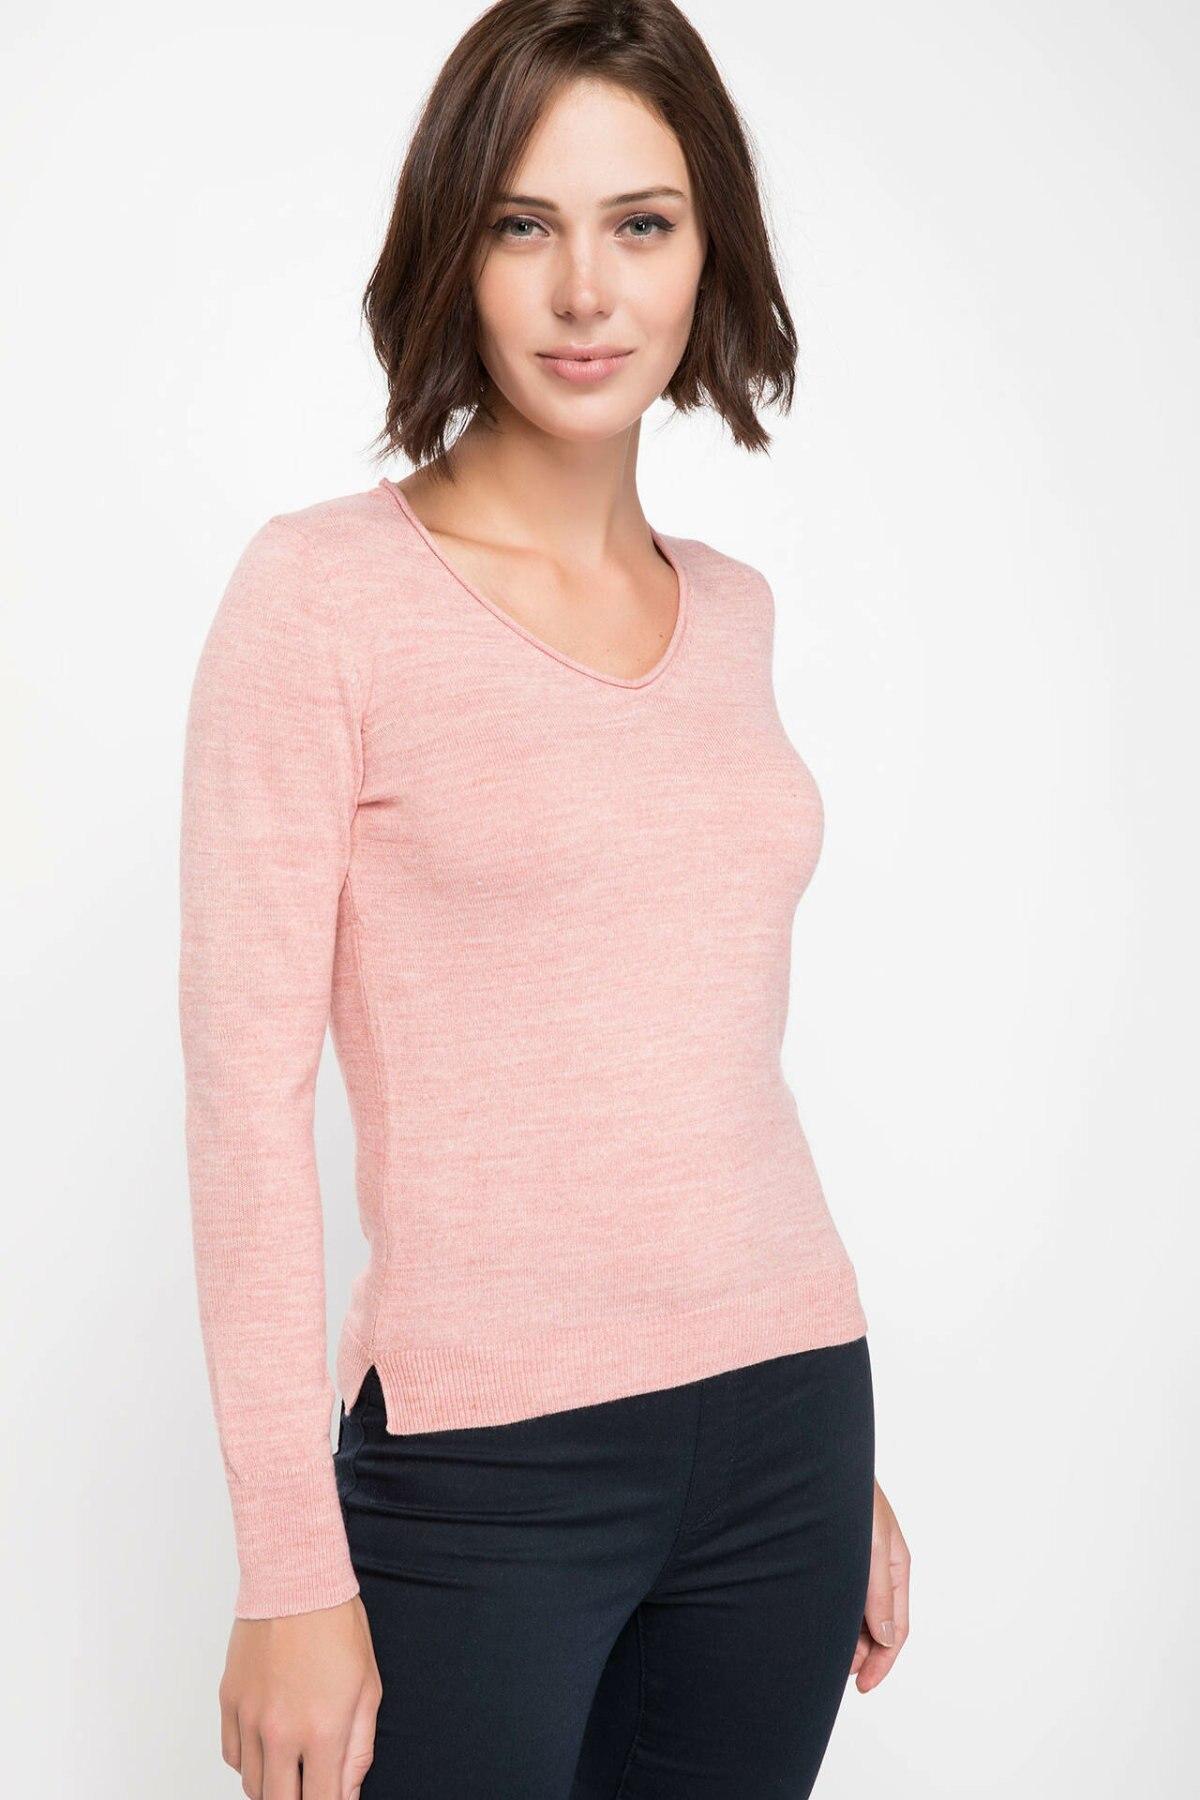 DeFacto Women Fashion V-neck Solid Knitted Warm Comfort Casual Knitted Sweatshirt Female New-F6797AZ18AU-F6797AZ18AU